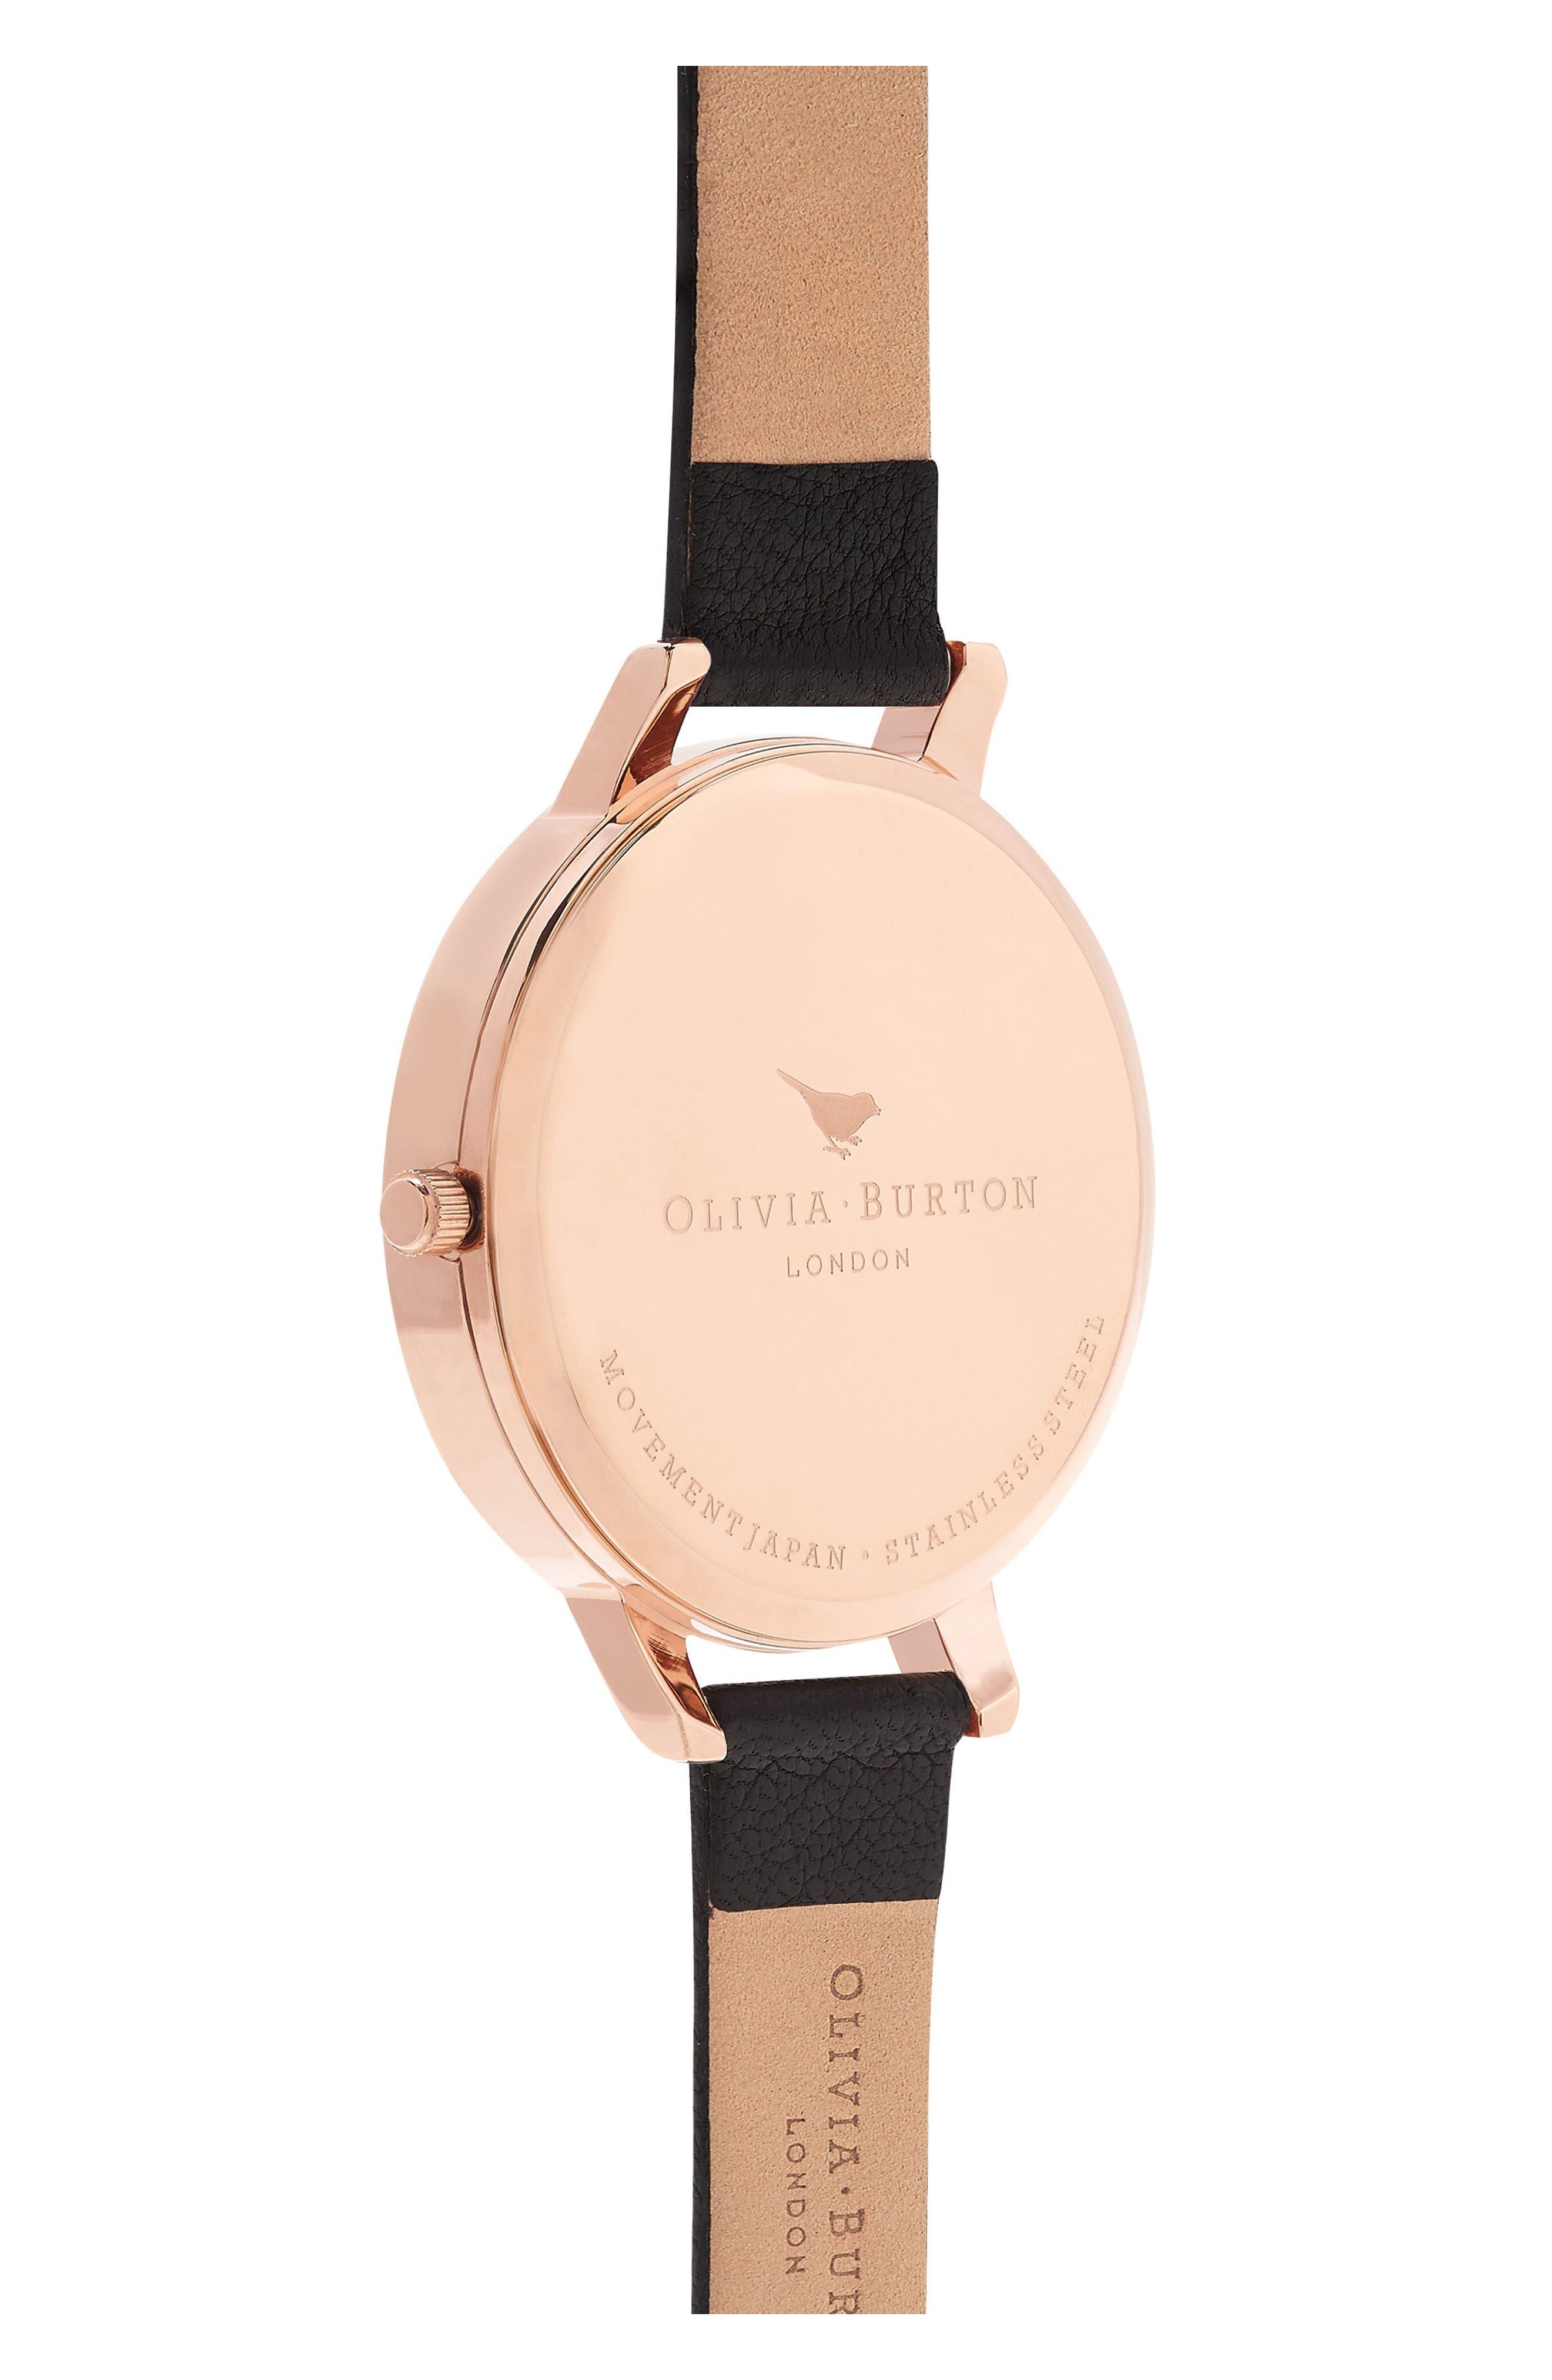 Dark Bouquet Leather Strap Watch, 38mm,                             Alternate thumbnail 2, color,                             BLACK/ FLORAL/ ROSE GOLD